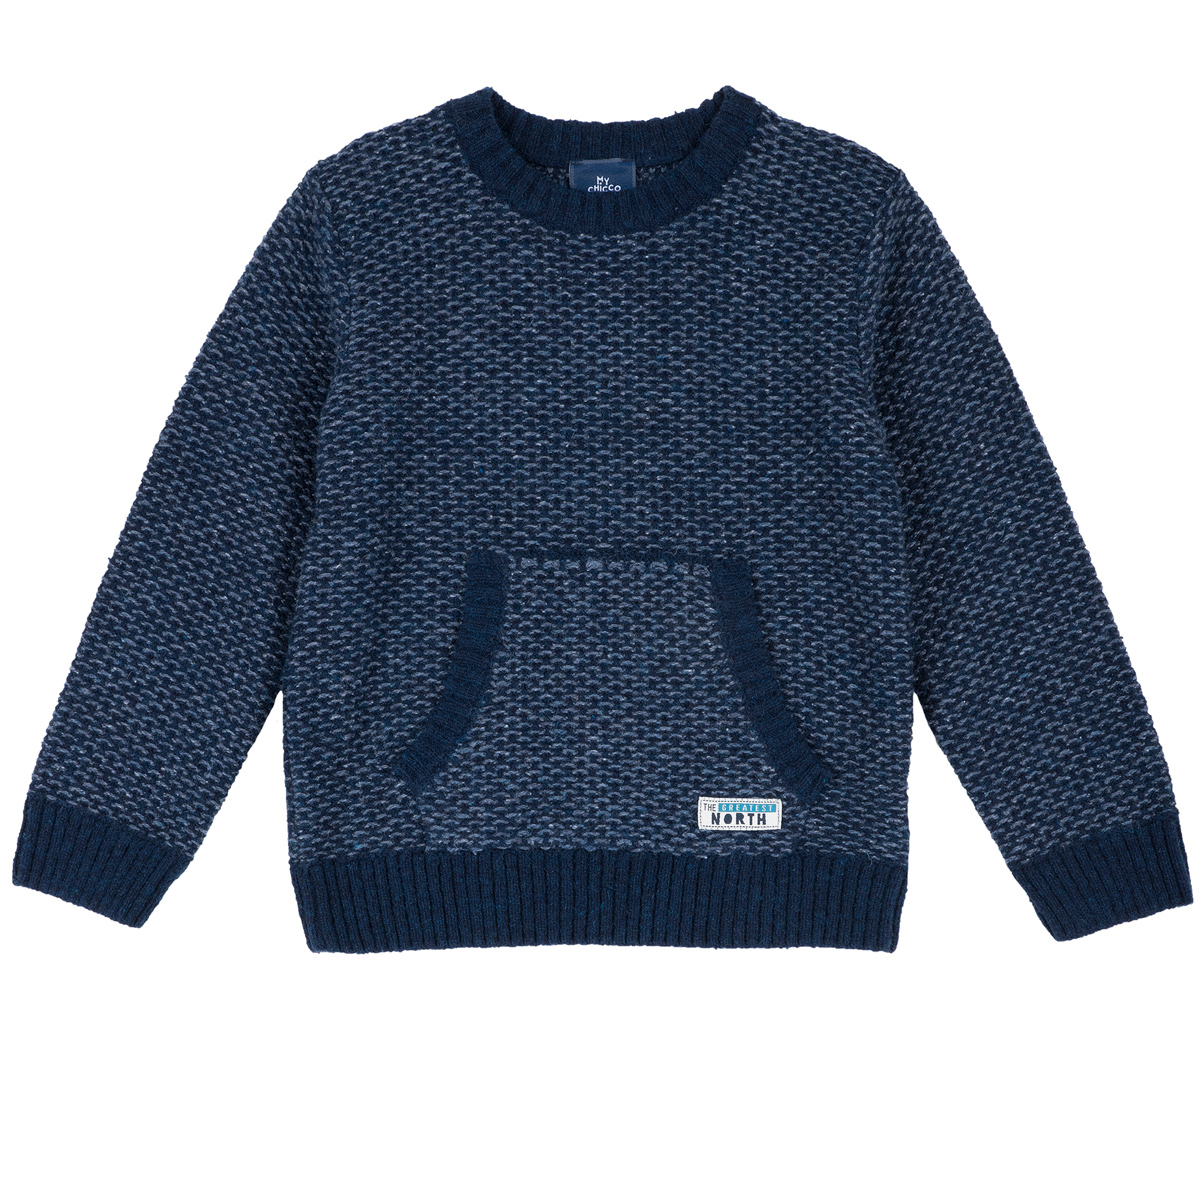 Pulover copii Chicco, tricotat, buzunar frontal aplicat, 69387